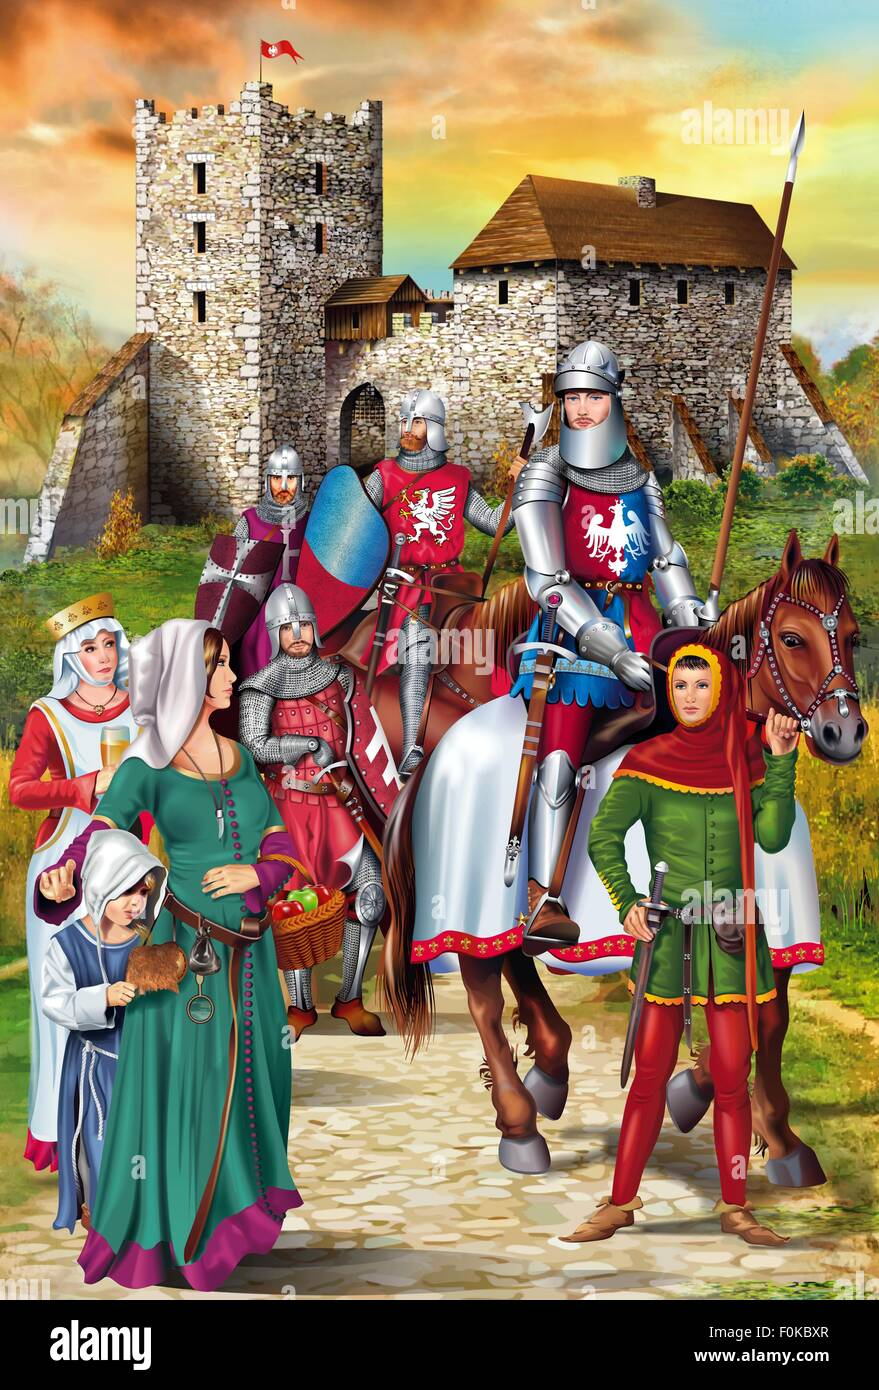 Castello medioevale con cavalieri